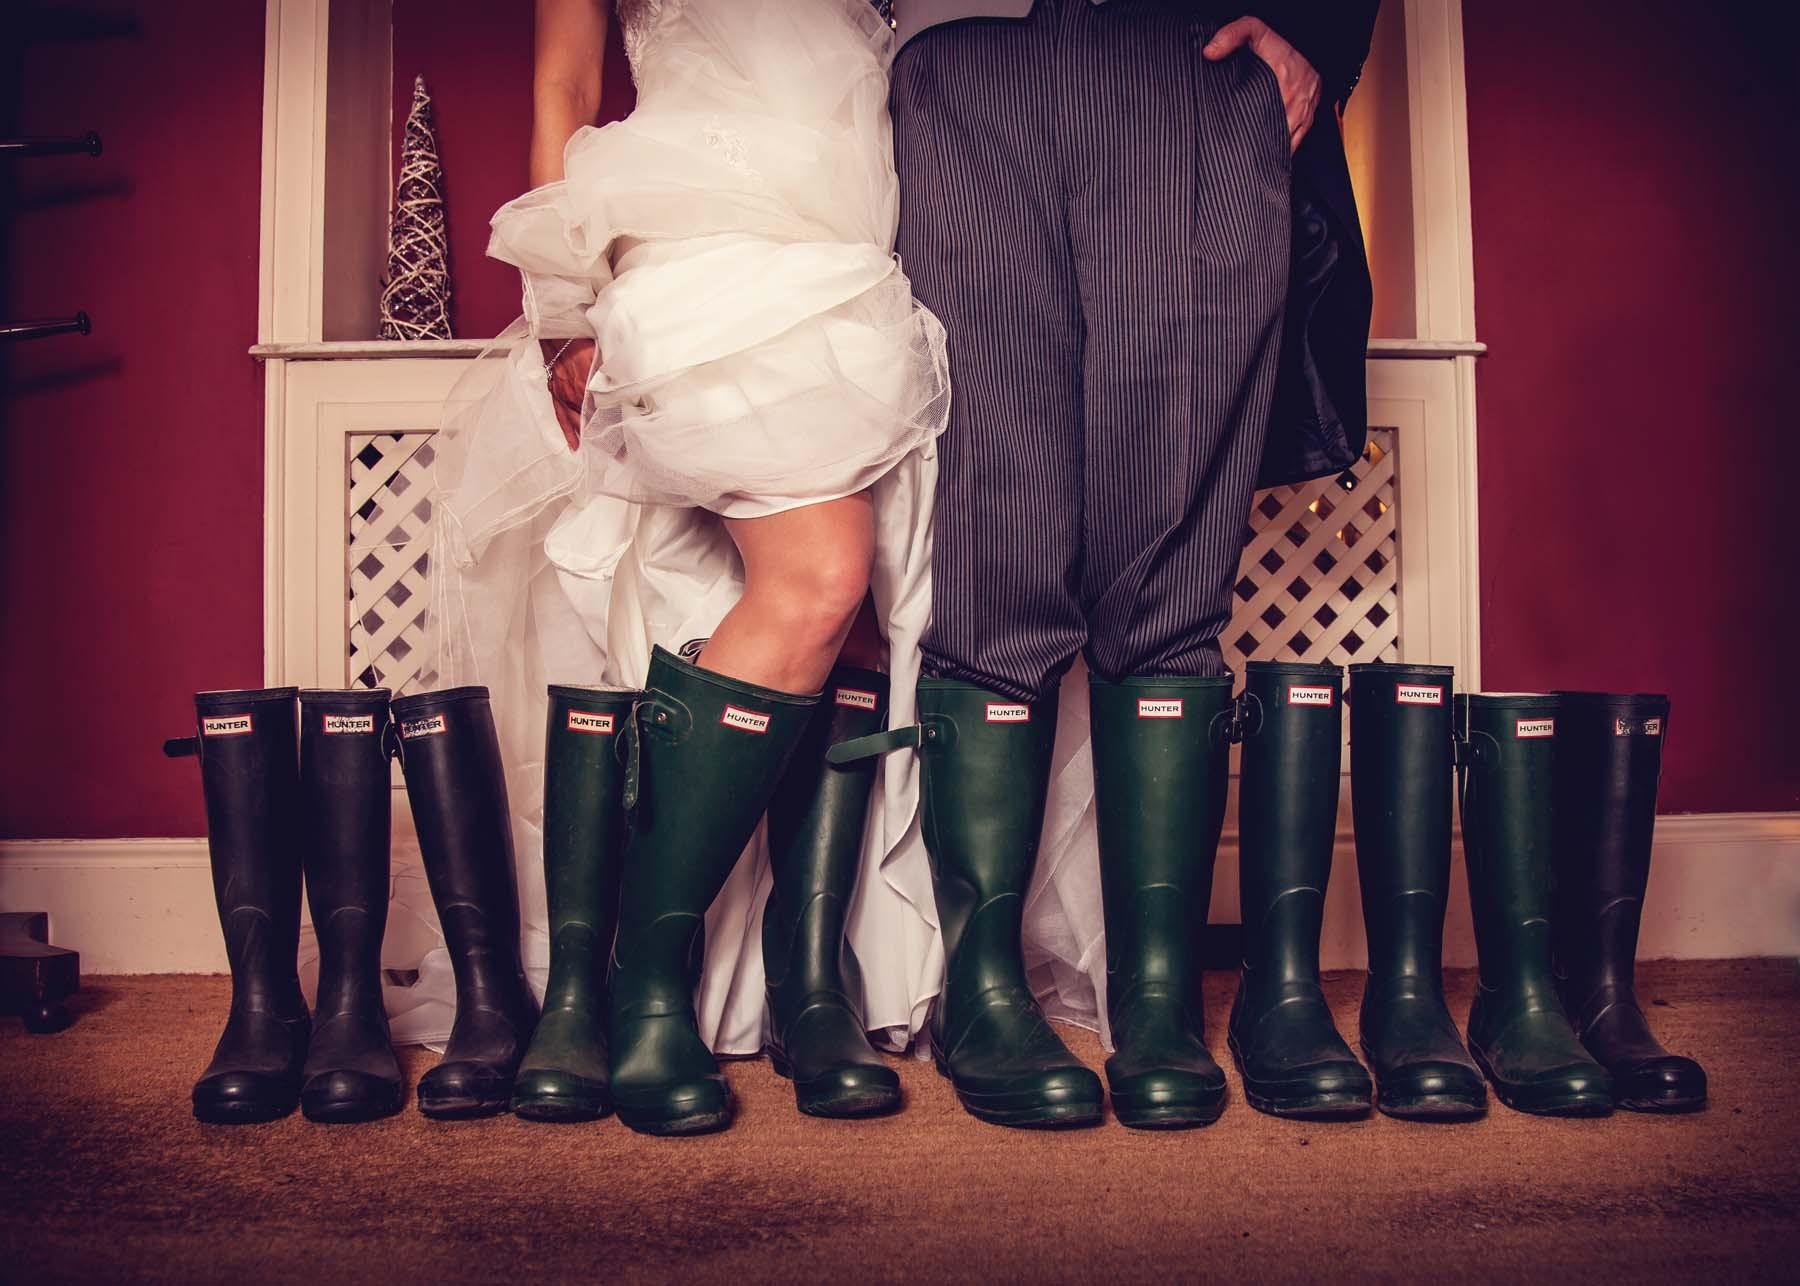 Sussex & Surrey Wedding Photographer - Bride & Groom (3)